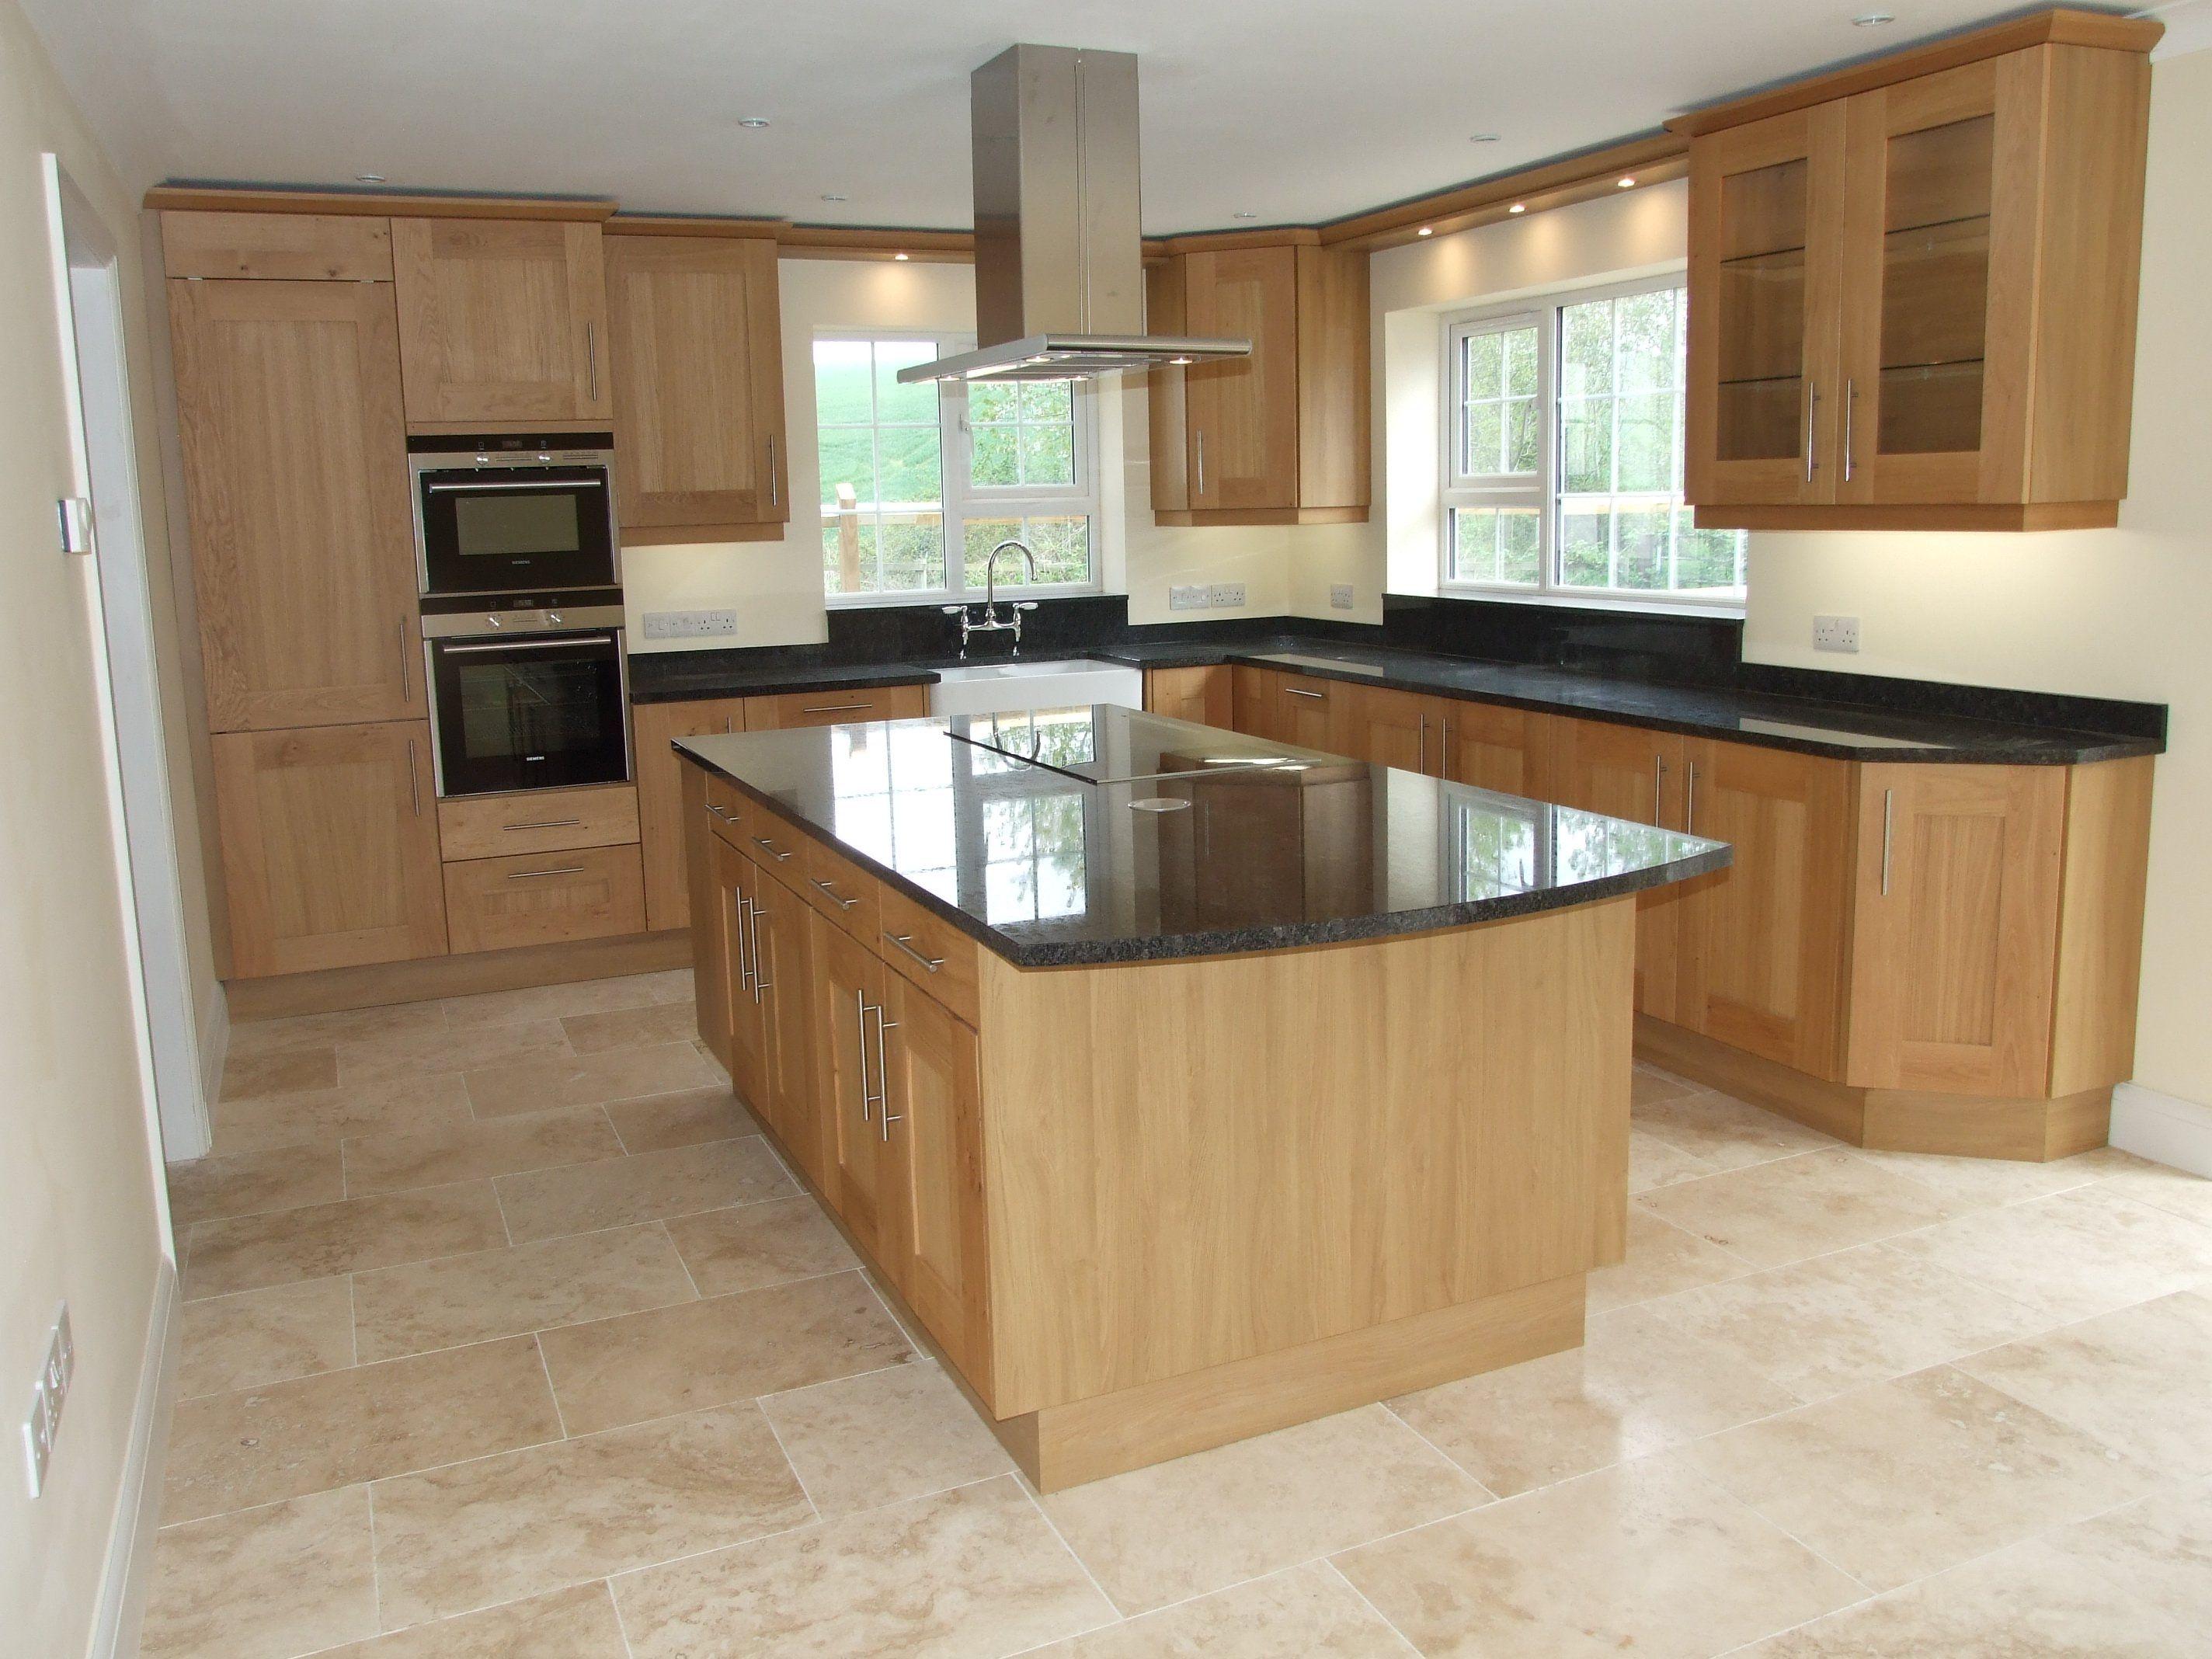 Kitchen Floor Ideas With Light Oak Cabinets Modern Oak Kitchen Kitchen Design Honey Oak Cabinets